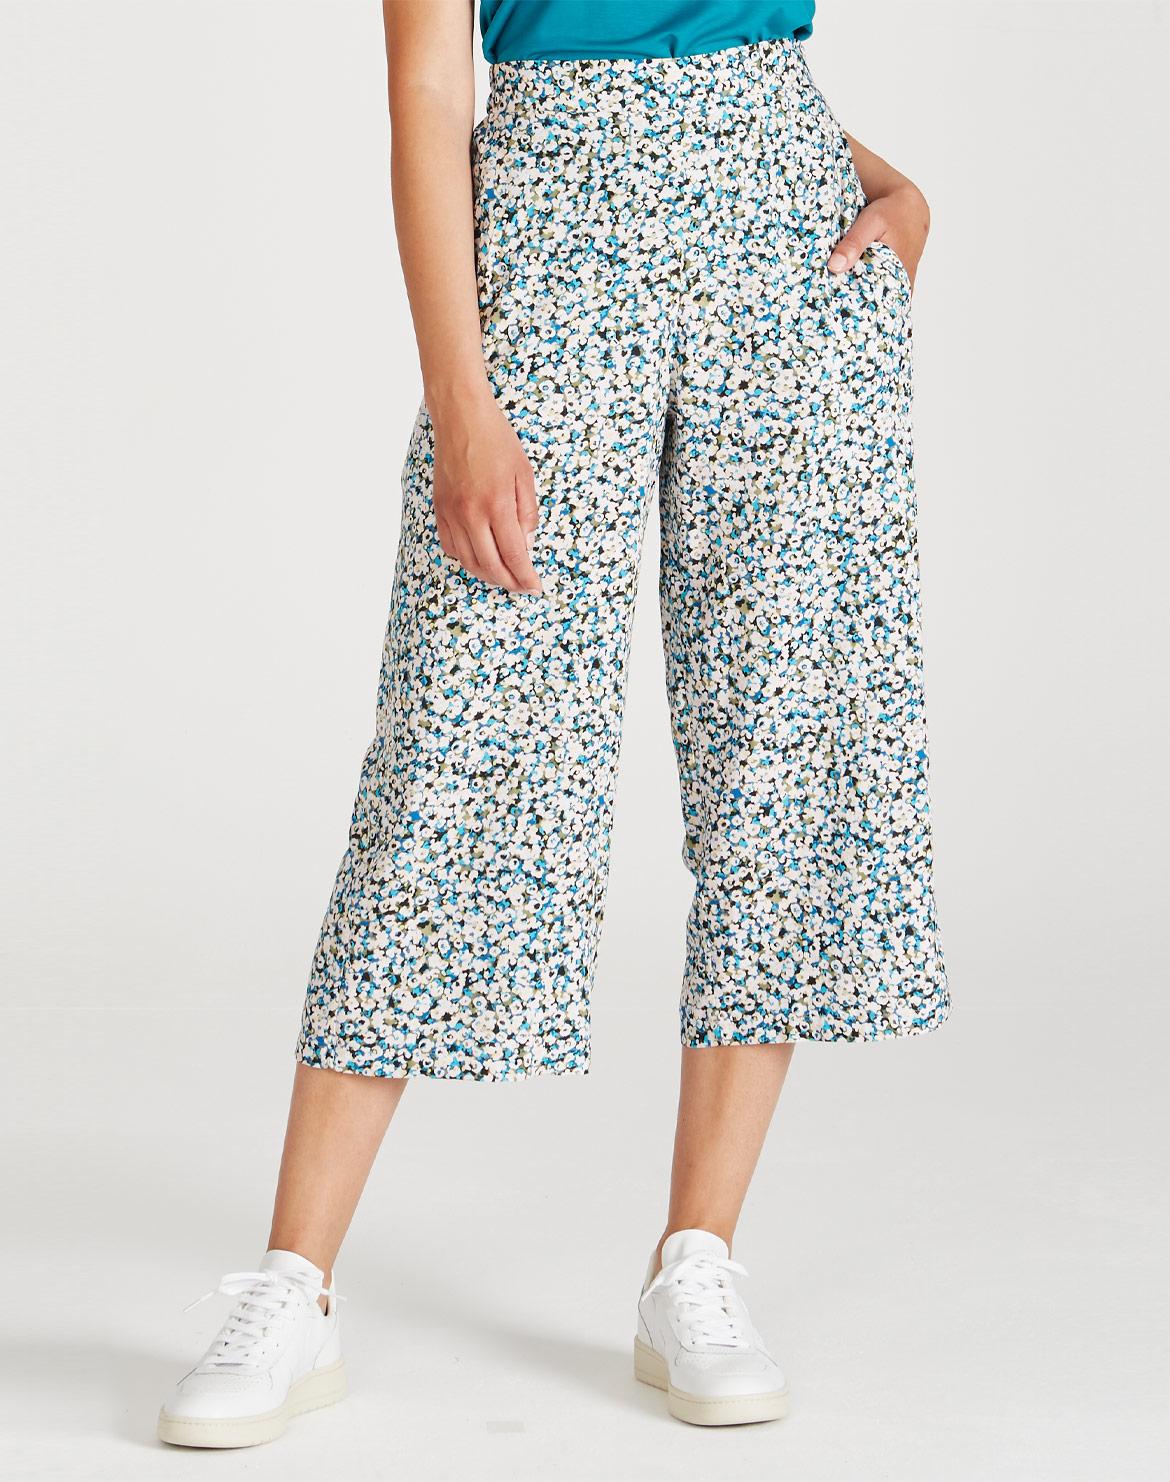 Blau/Grün (Flowers)